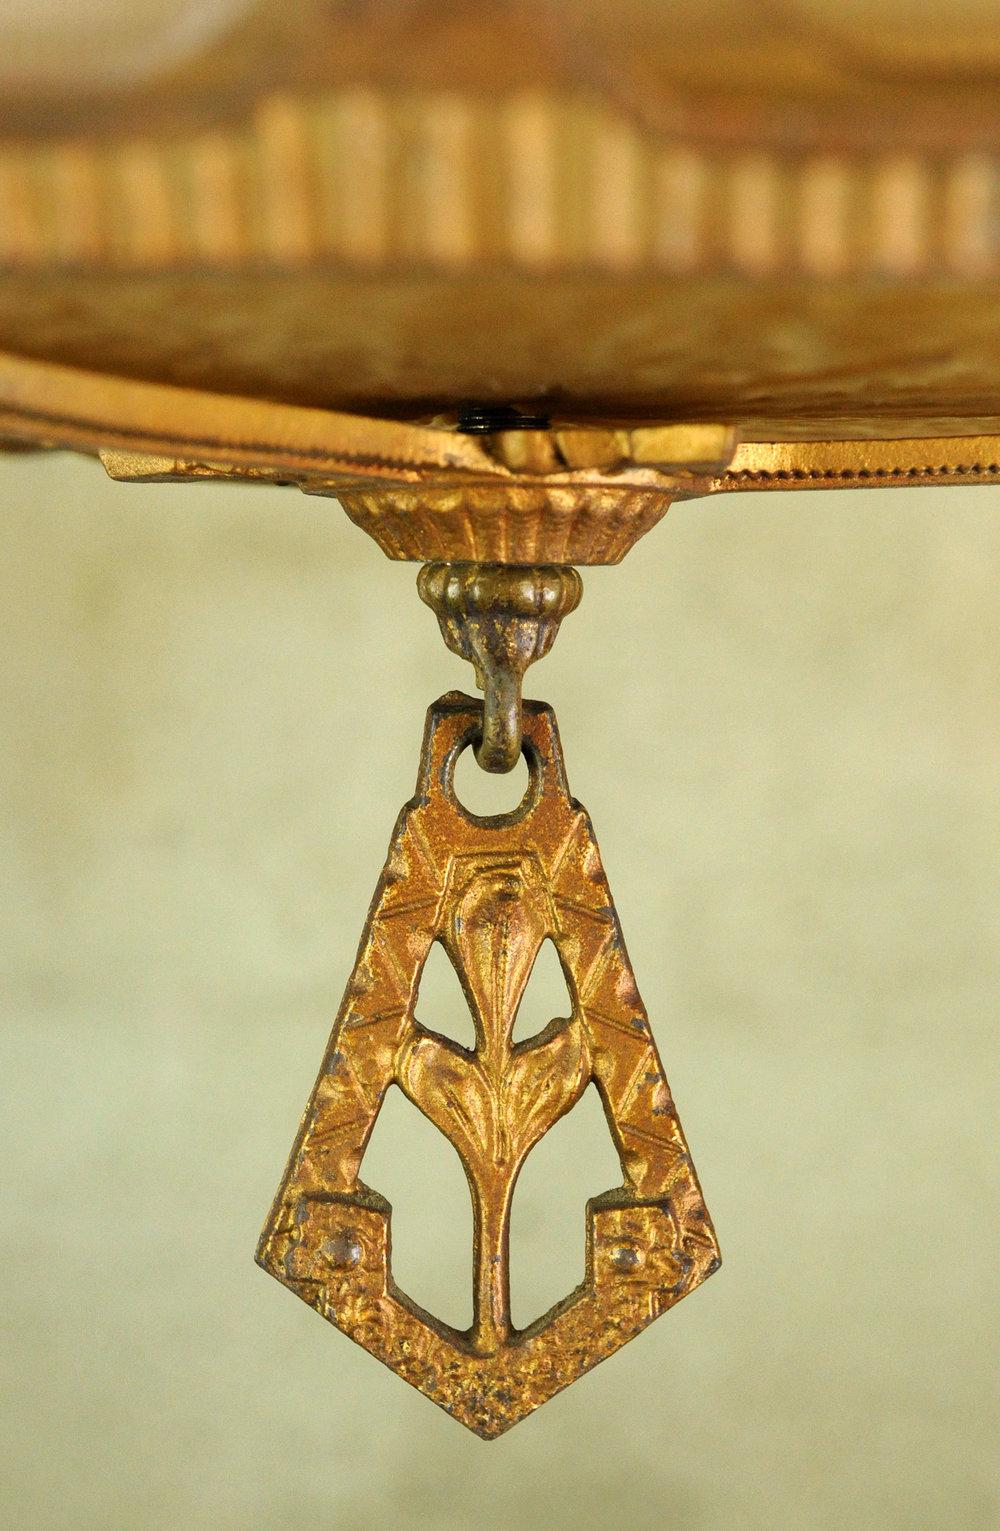 46961-art-deco-chandelier-close-up.jpg